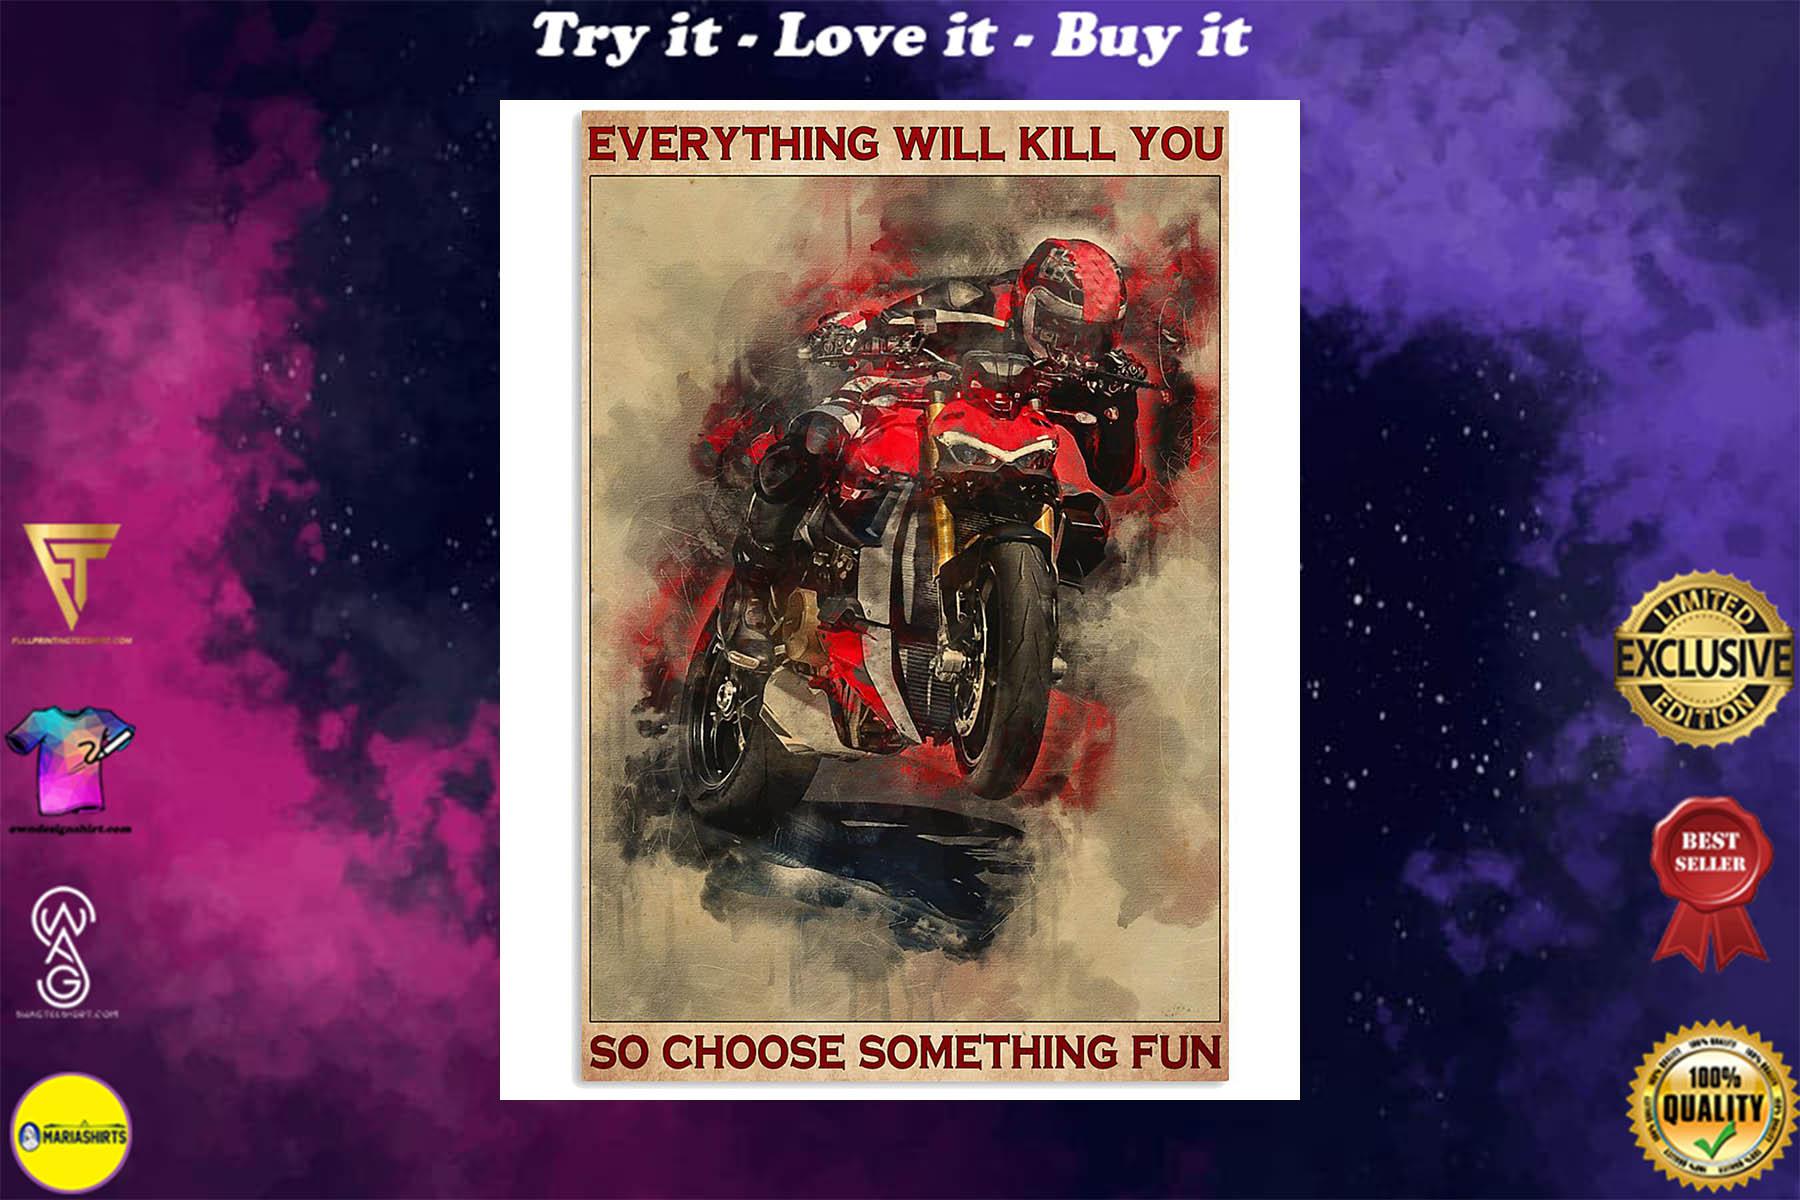 everything will kill you so choose something fun ducati retro poster